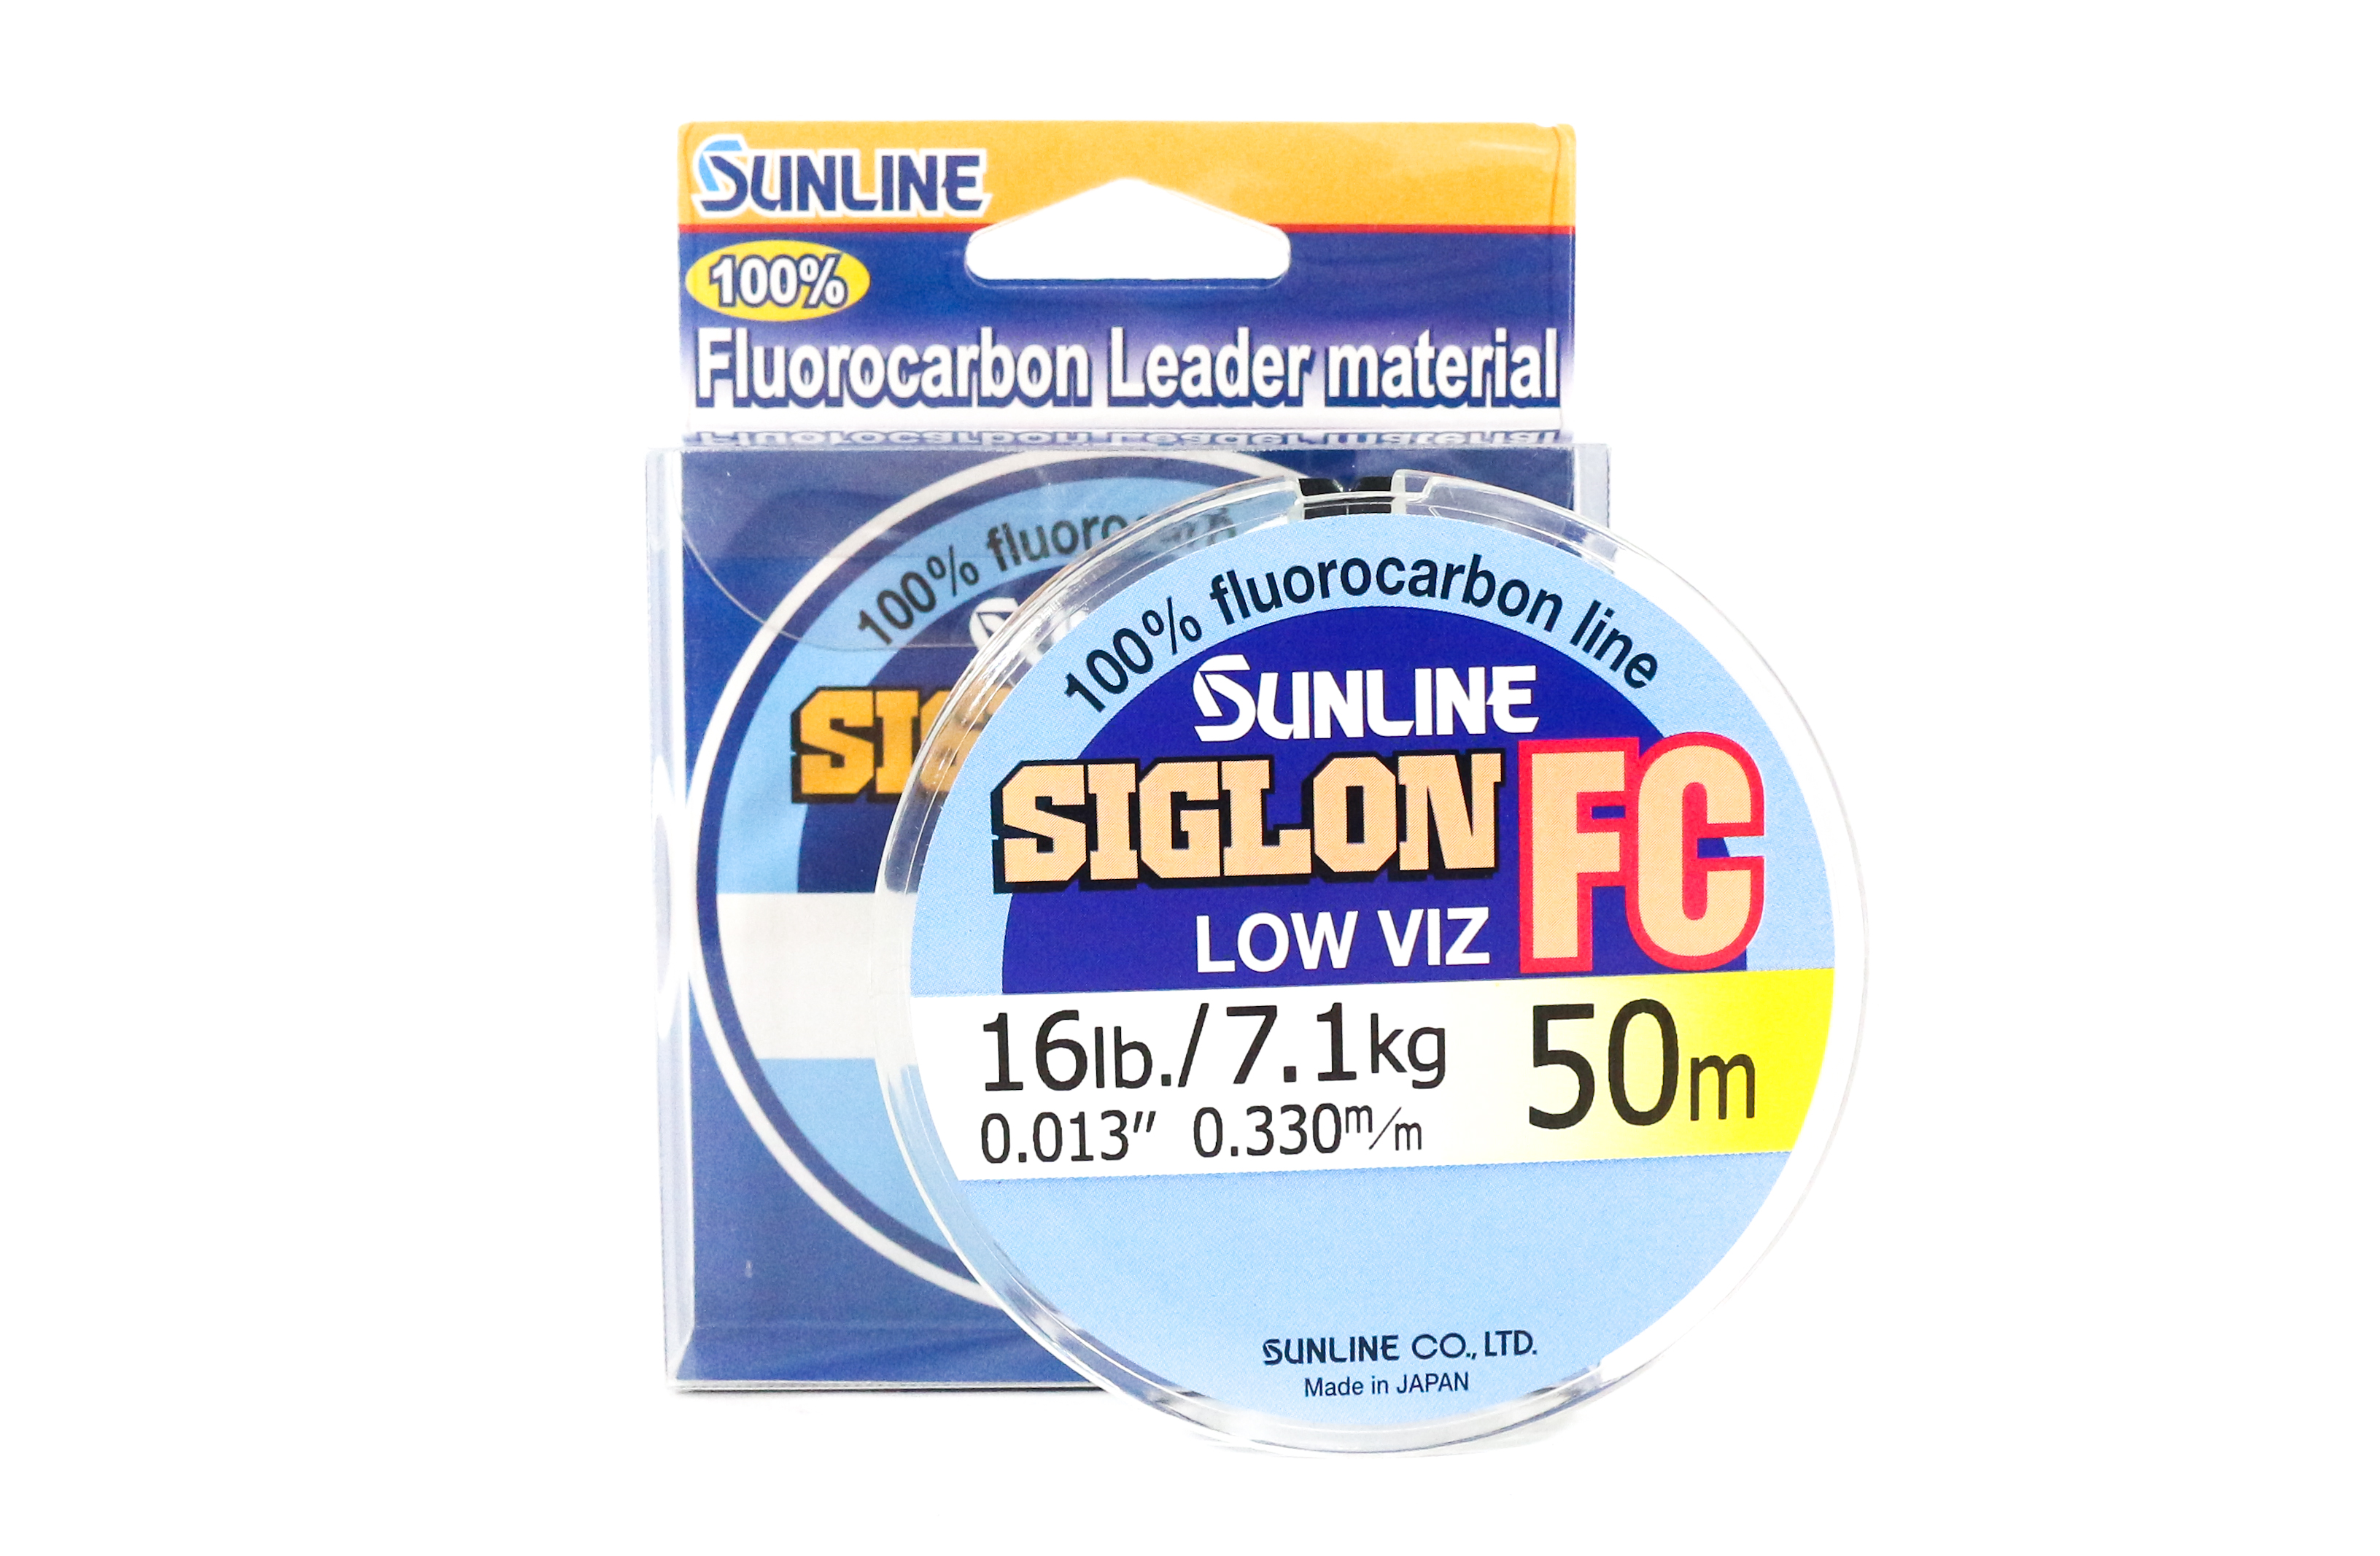 Sunline Siglon FC Fluorocarbon Line 50m 16lb Diameter 0.33 mm (5884)